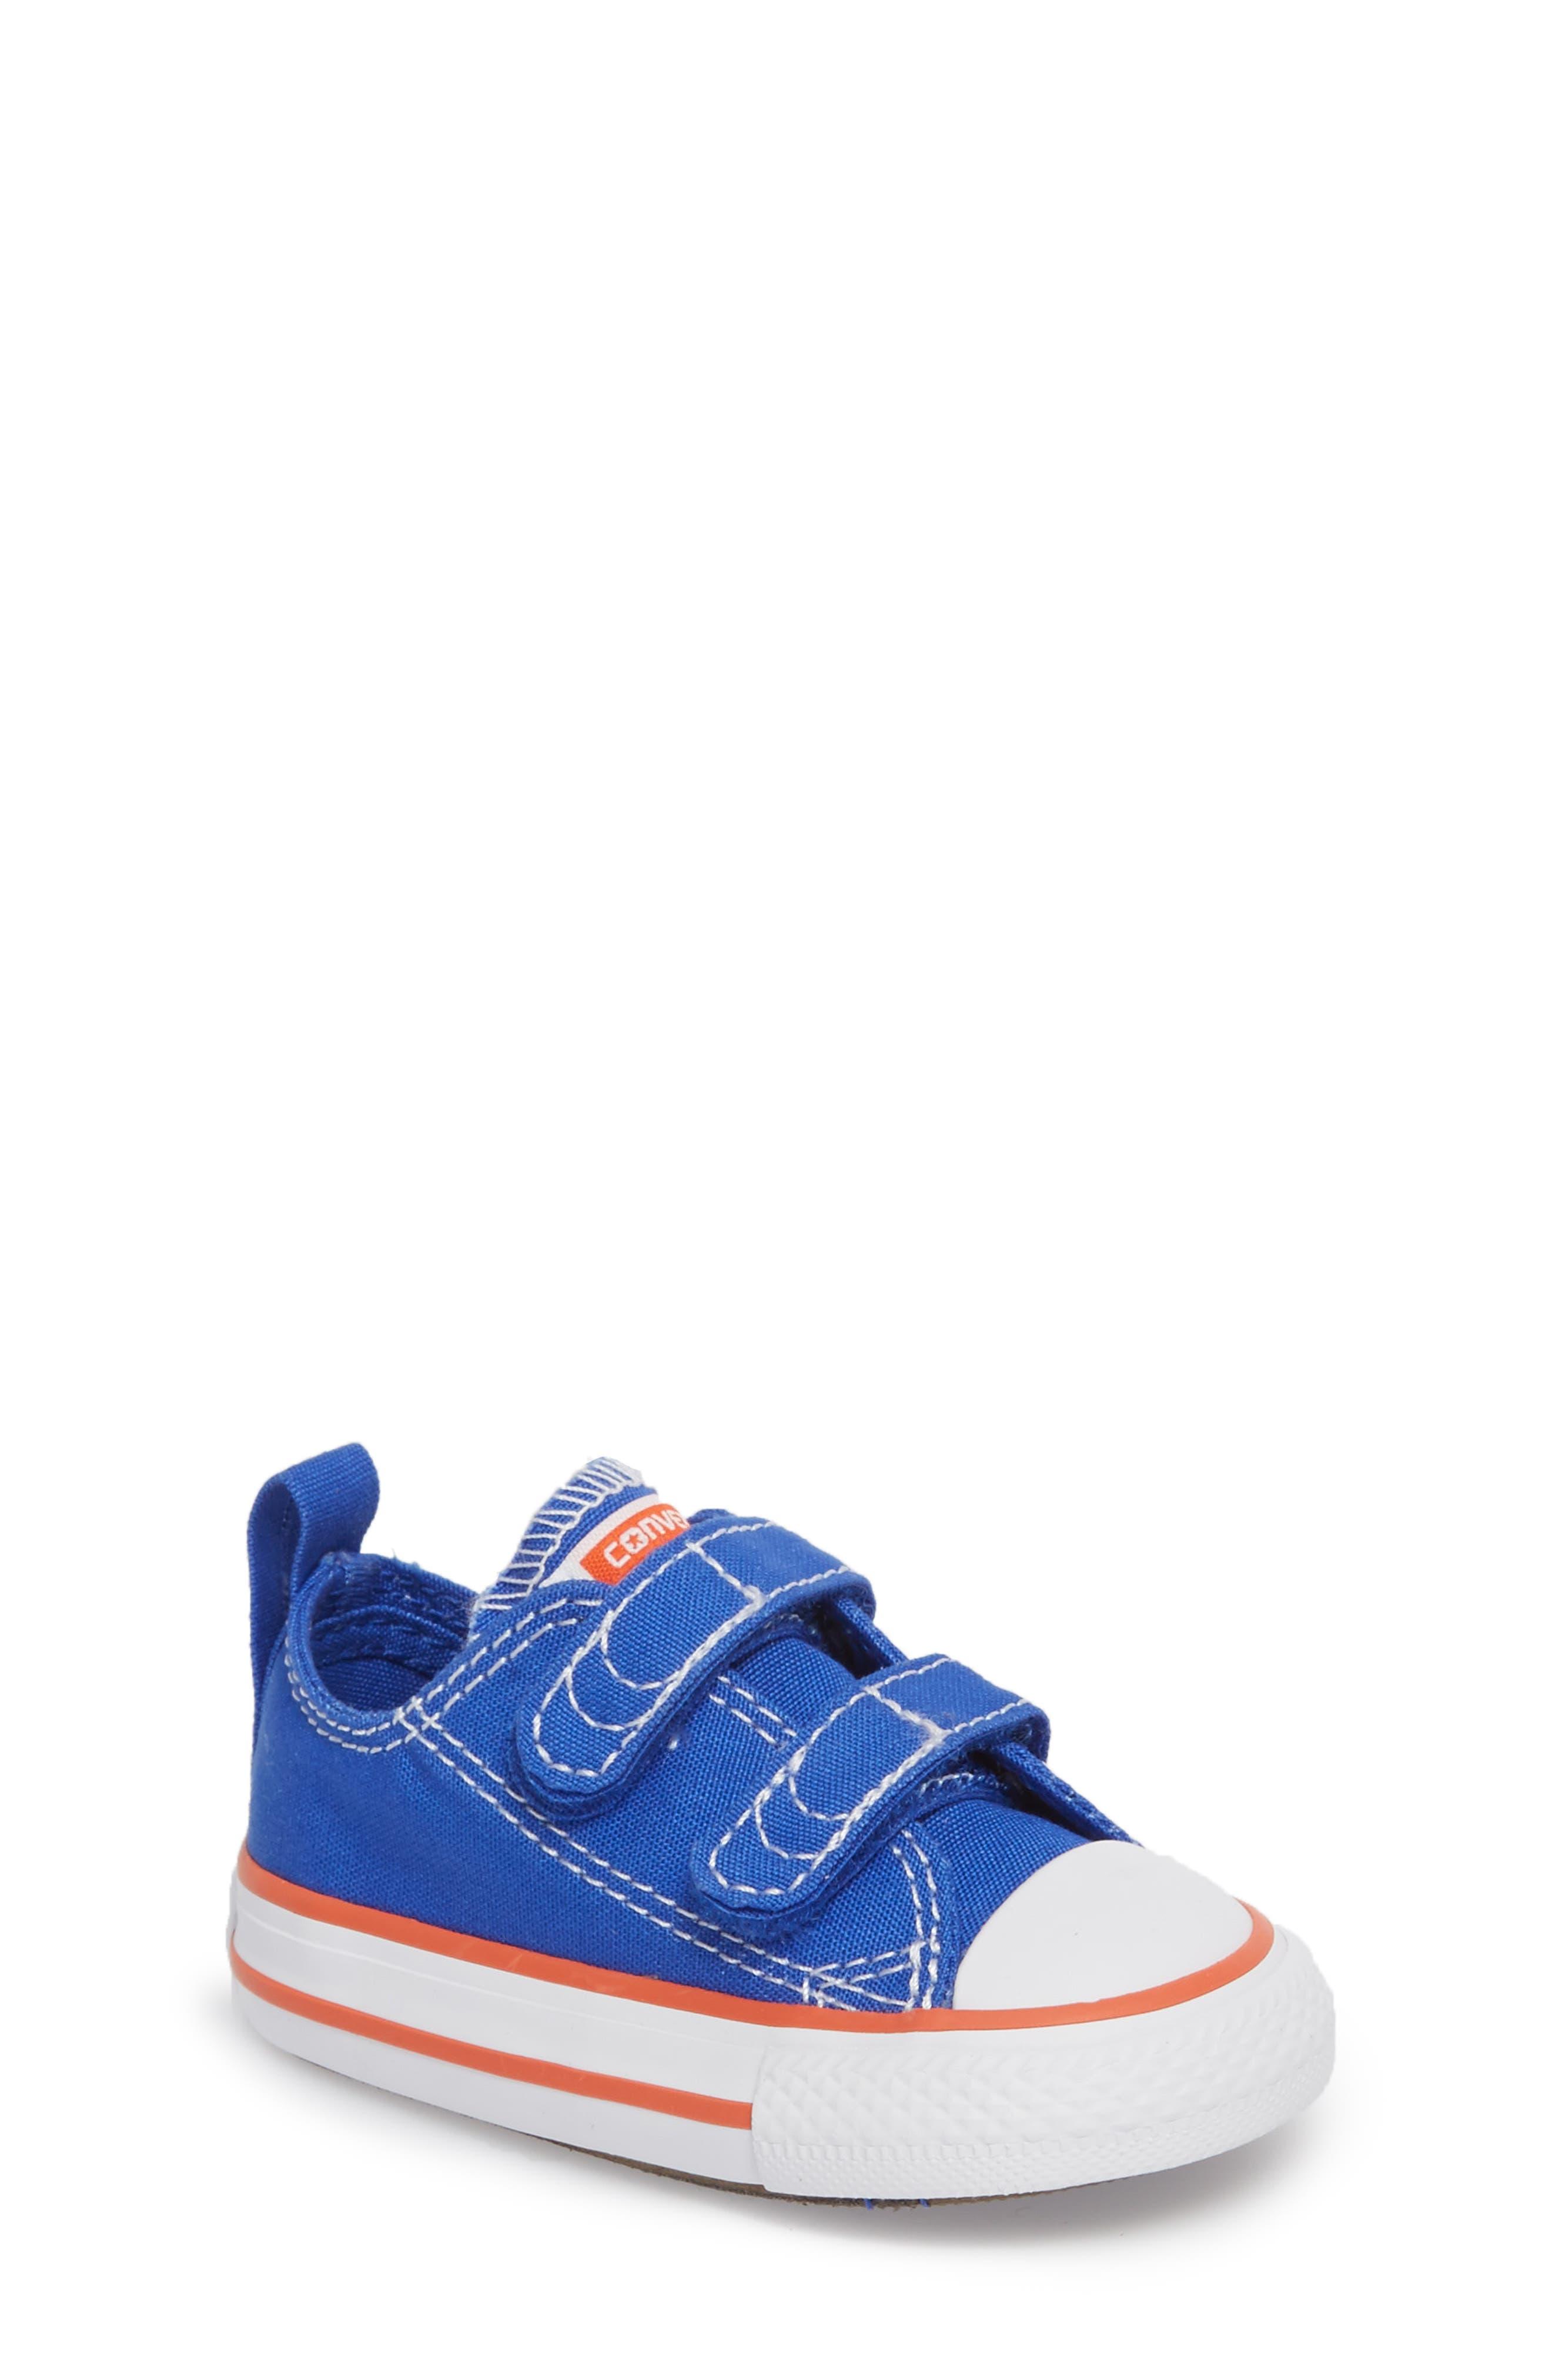 Chuck Taylor<sup>®</sup> All Star<sup>®</sup> Seasonal 2V Low Top Sneaker,                         Main,                         color, 483